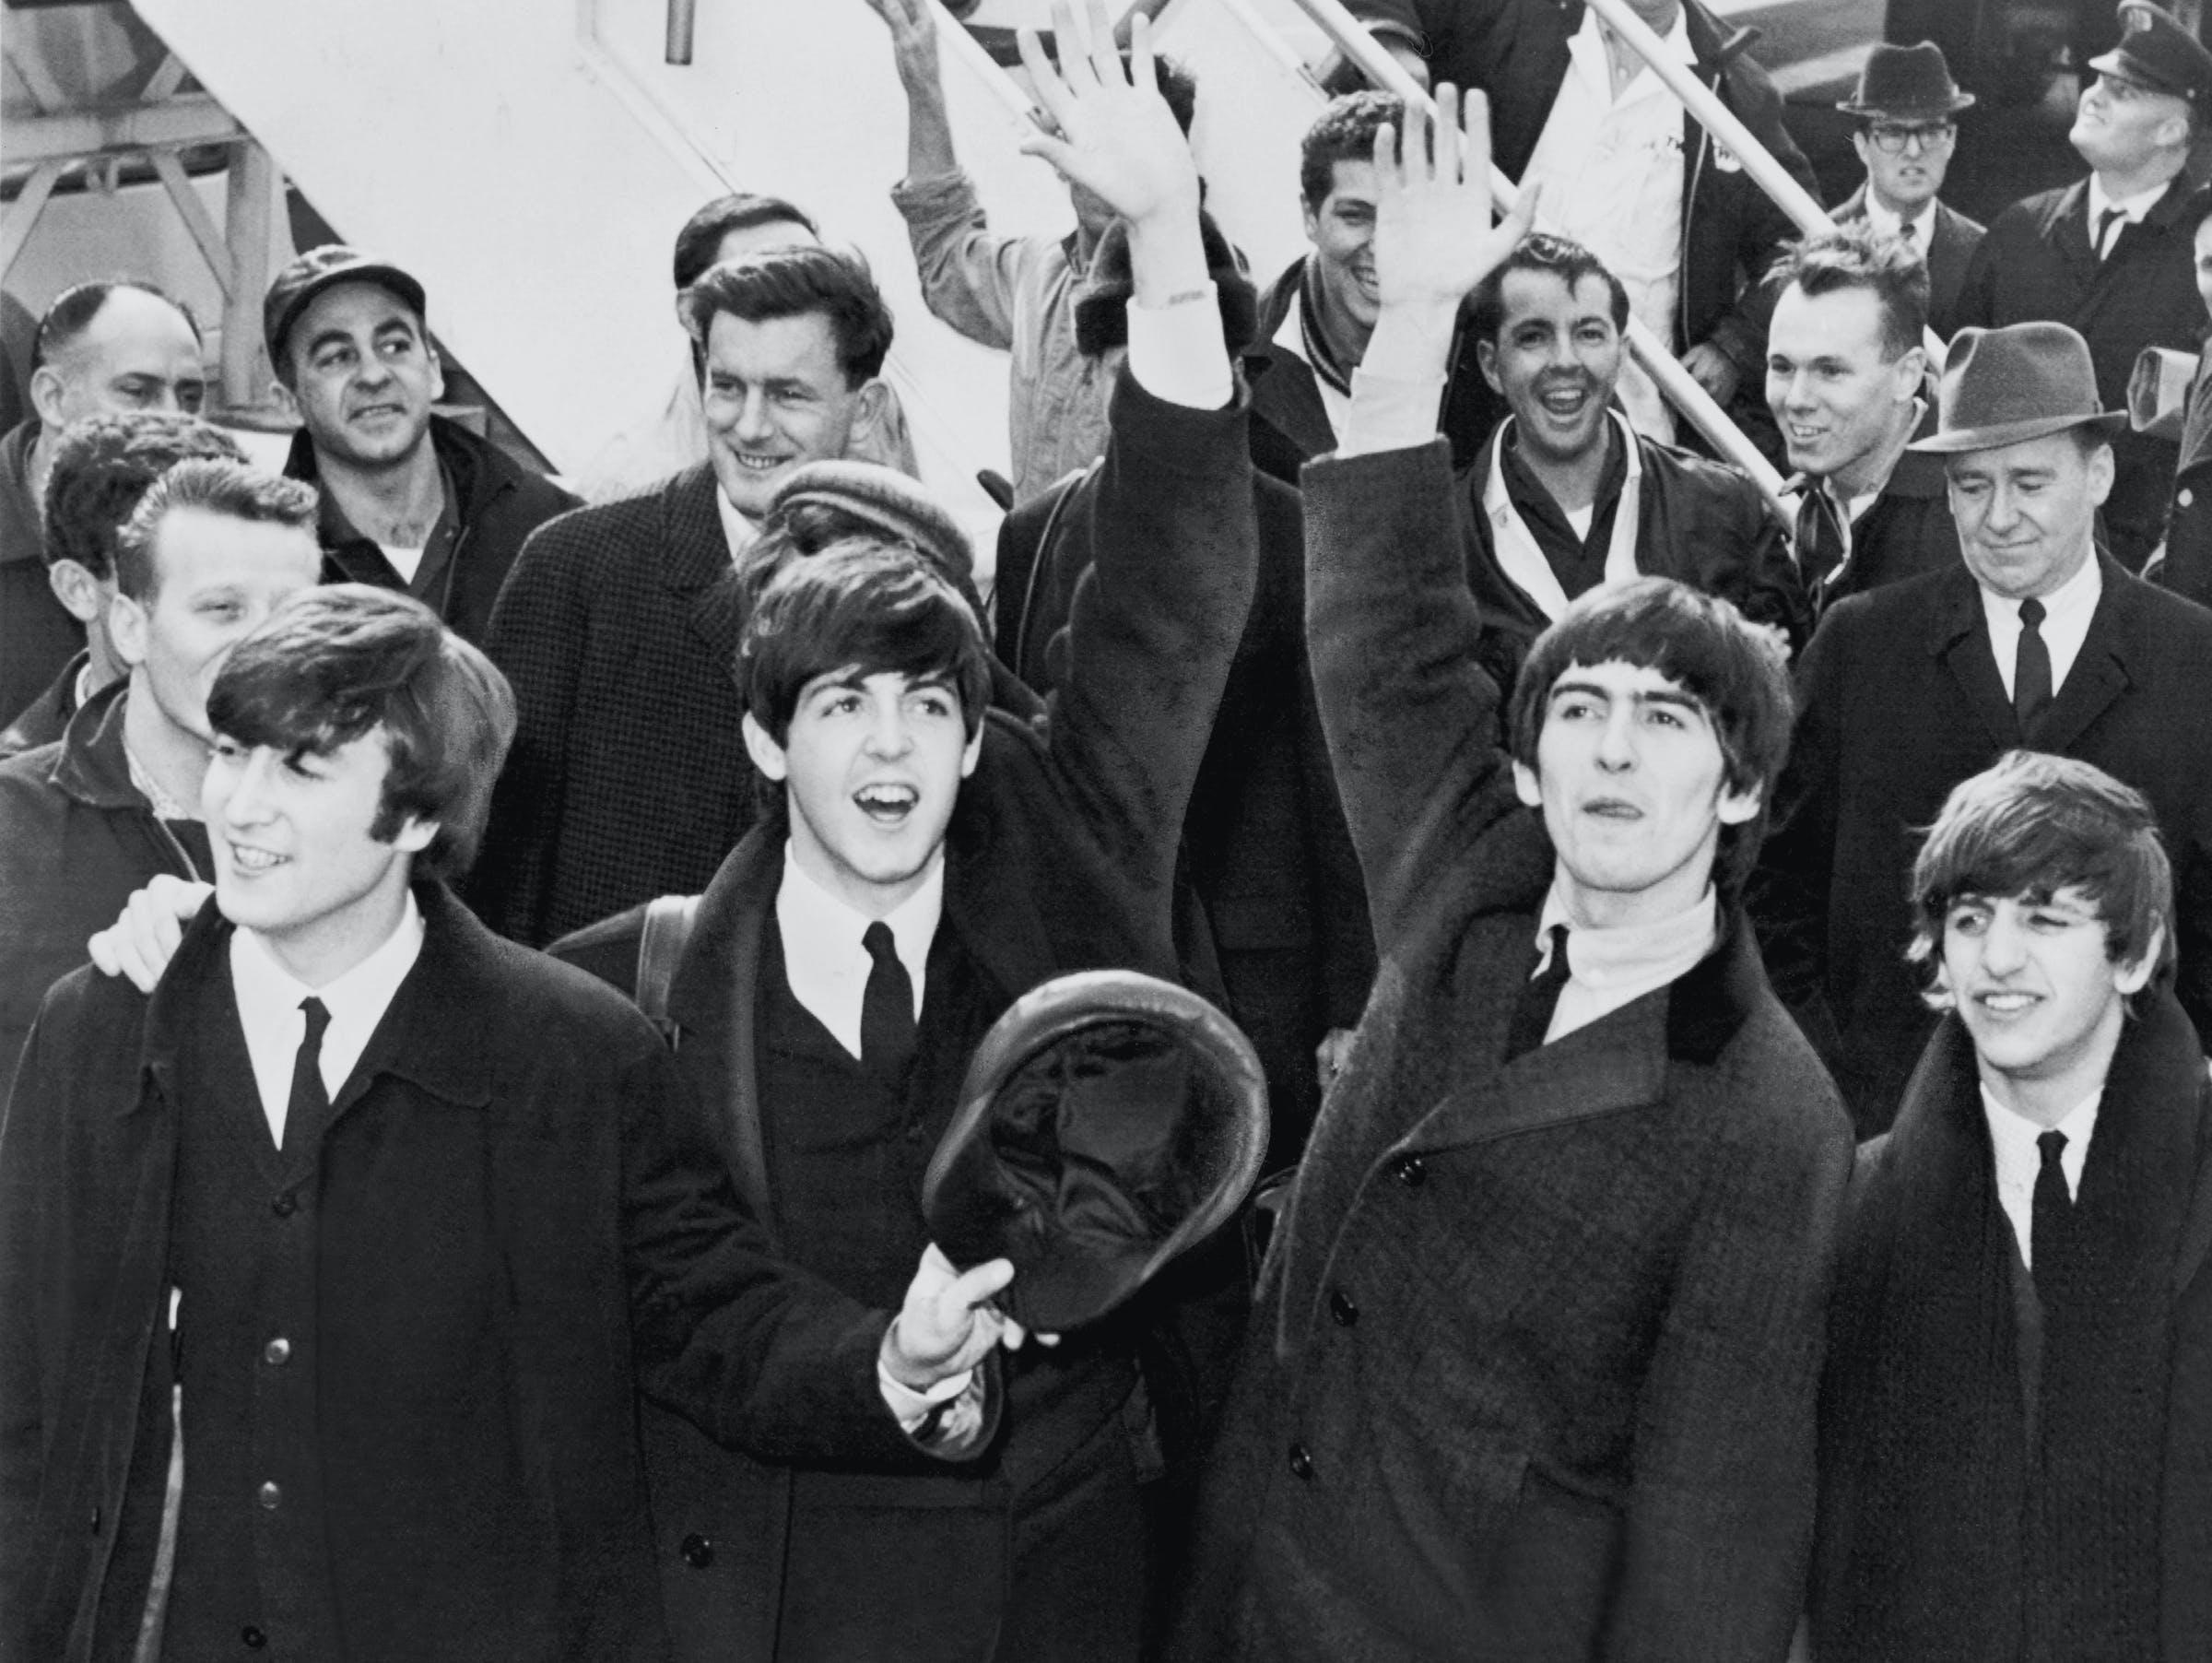 Lennon or McCartney? Math Model Settles Who Wrote the